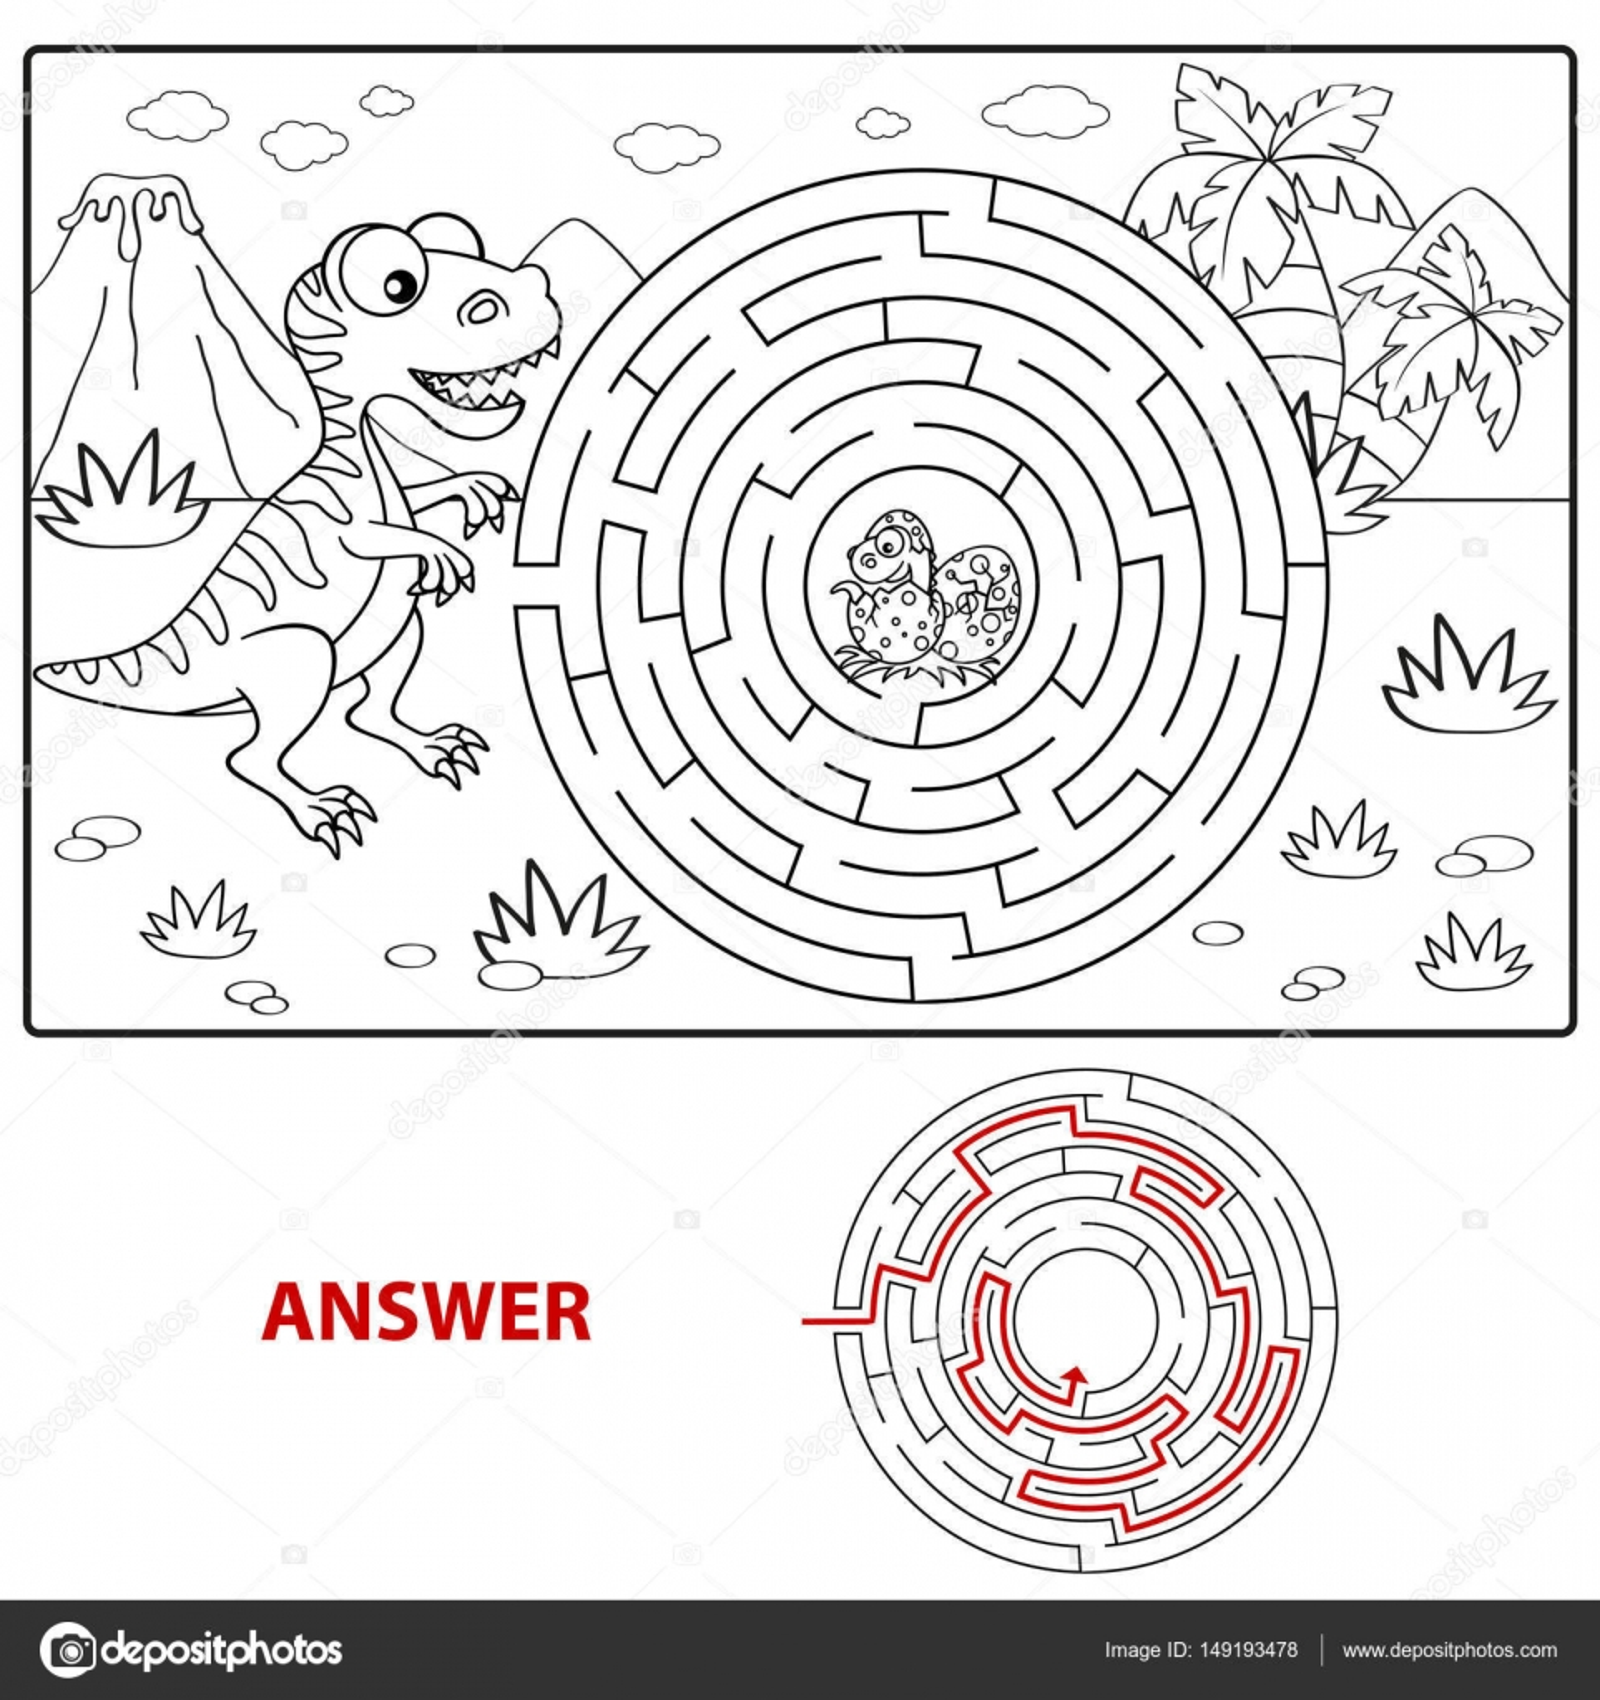 Ayudar a dinosaurio a encontrar camino para anidar. Laberinto ...